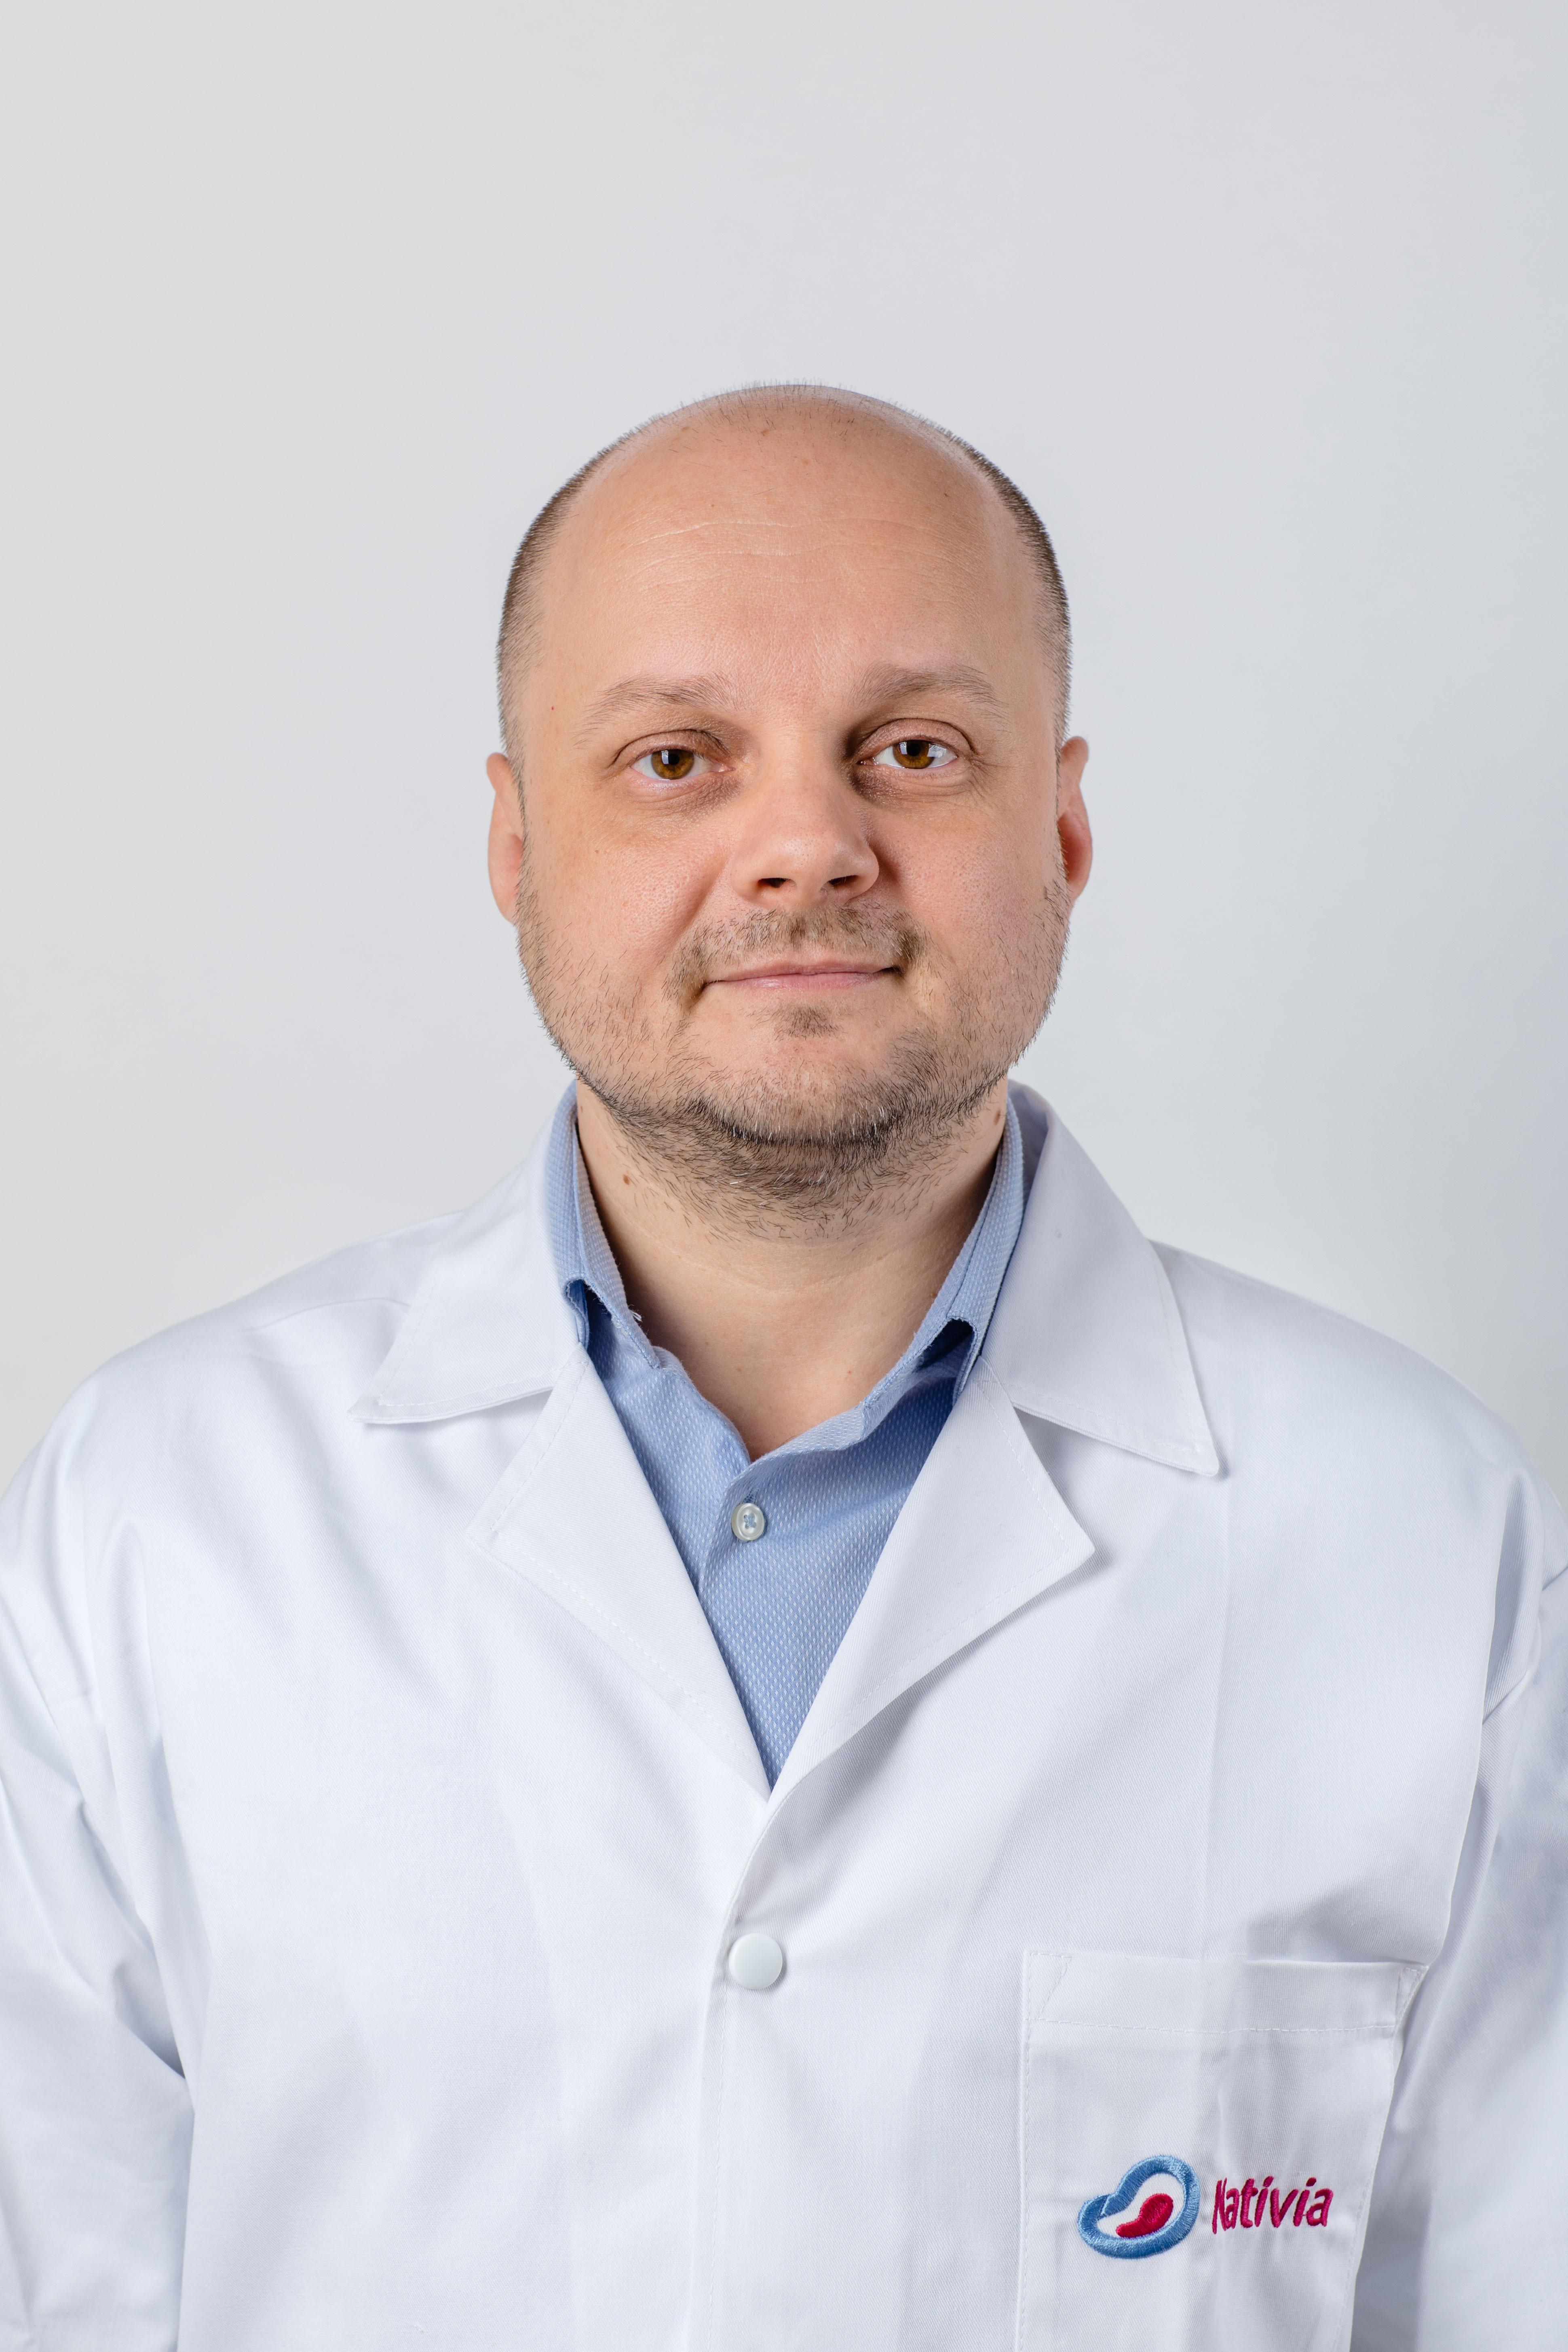 Dr. Eugen Cane -  Nativia